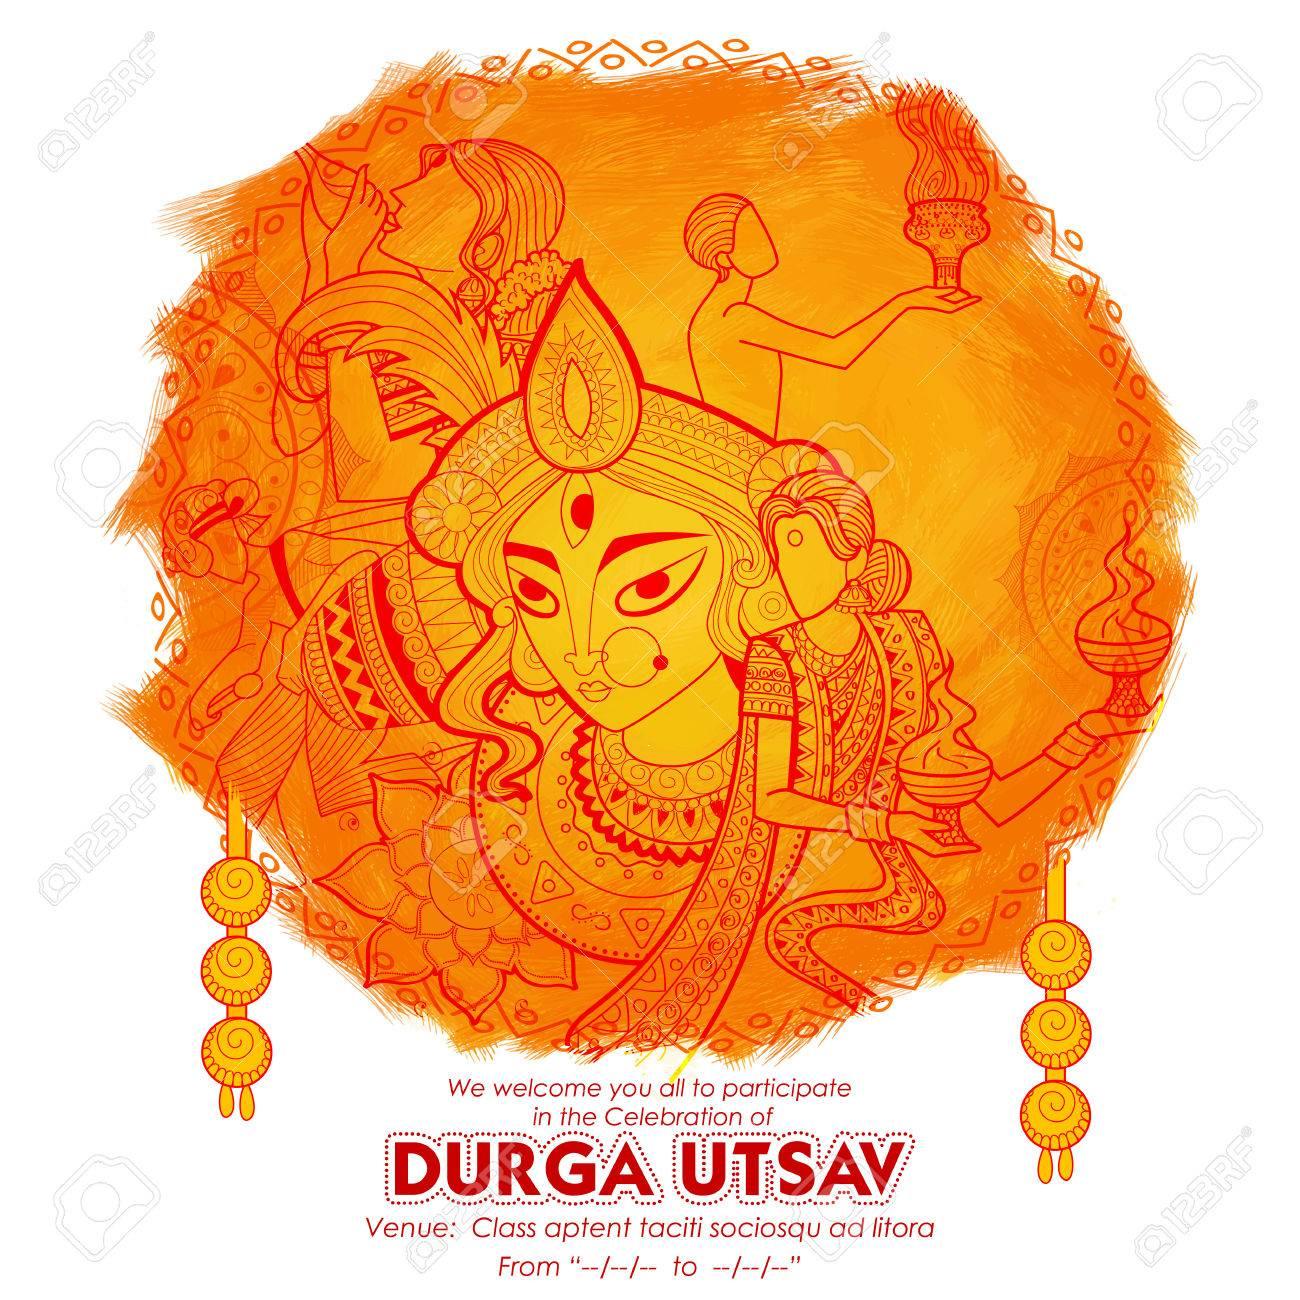 Goddess Durga in Subho Bijoya Happy Dussehra background - 81186540